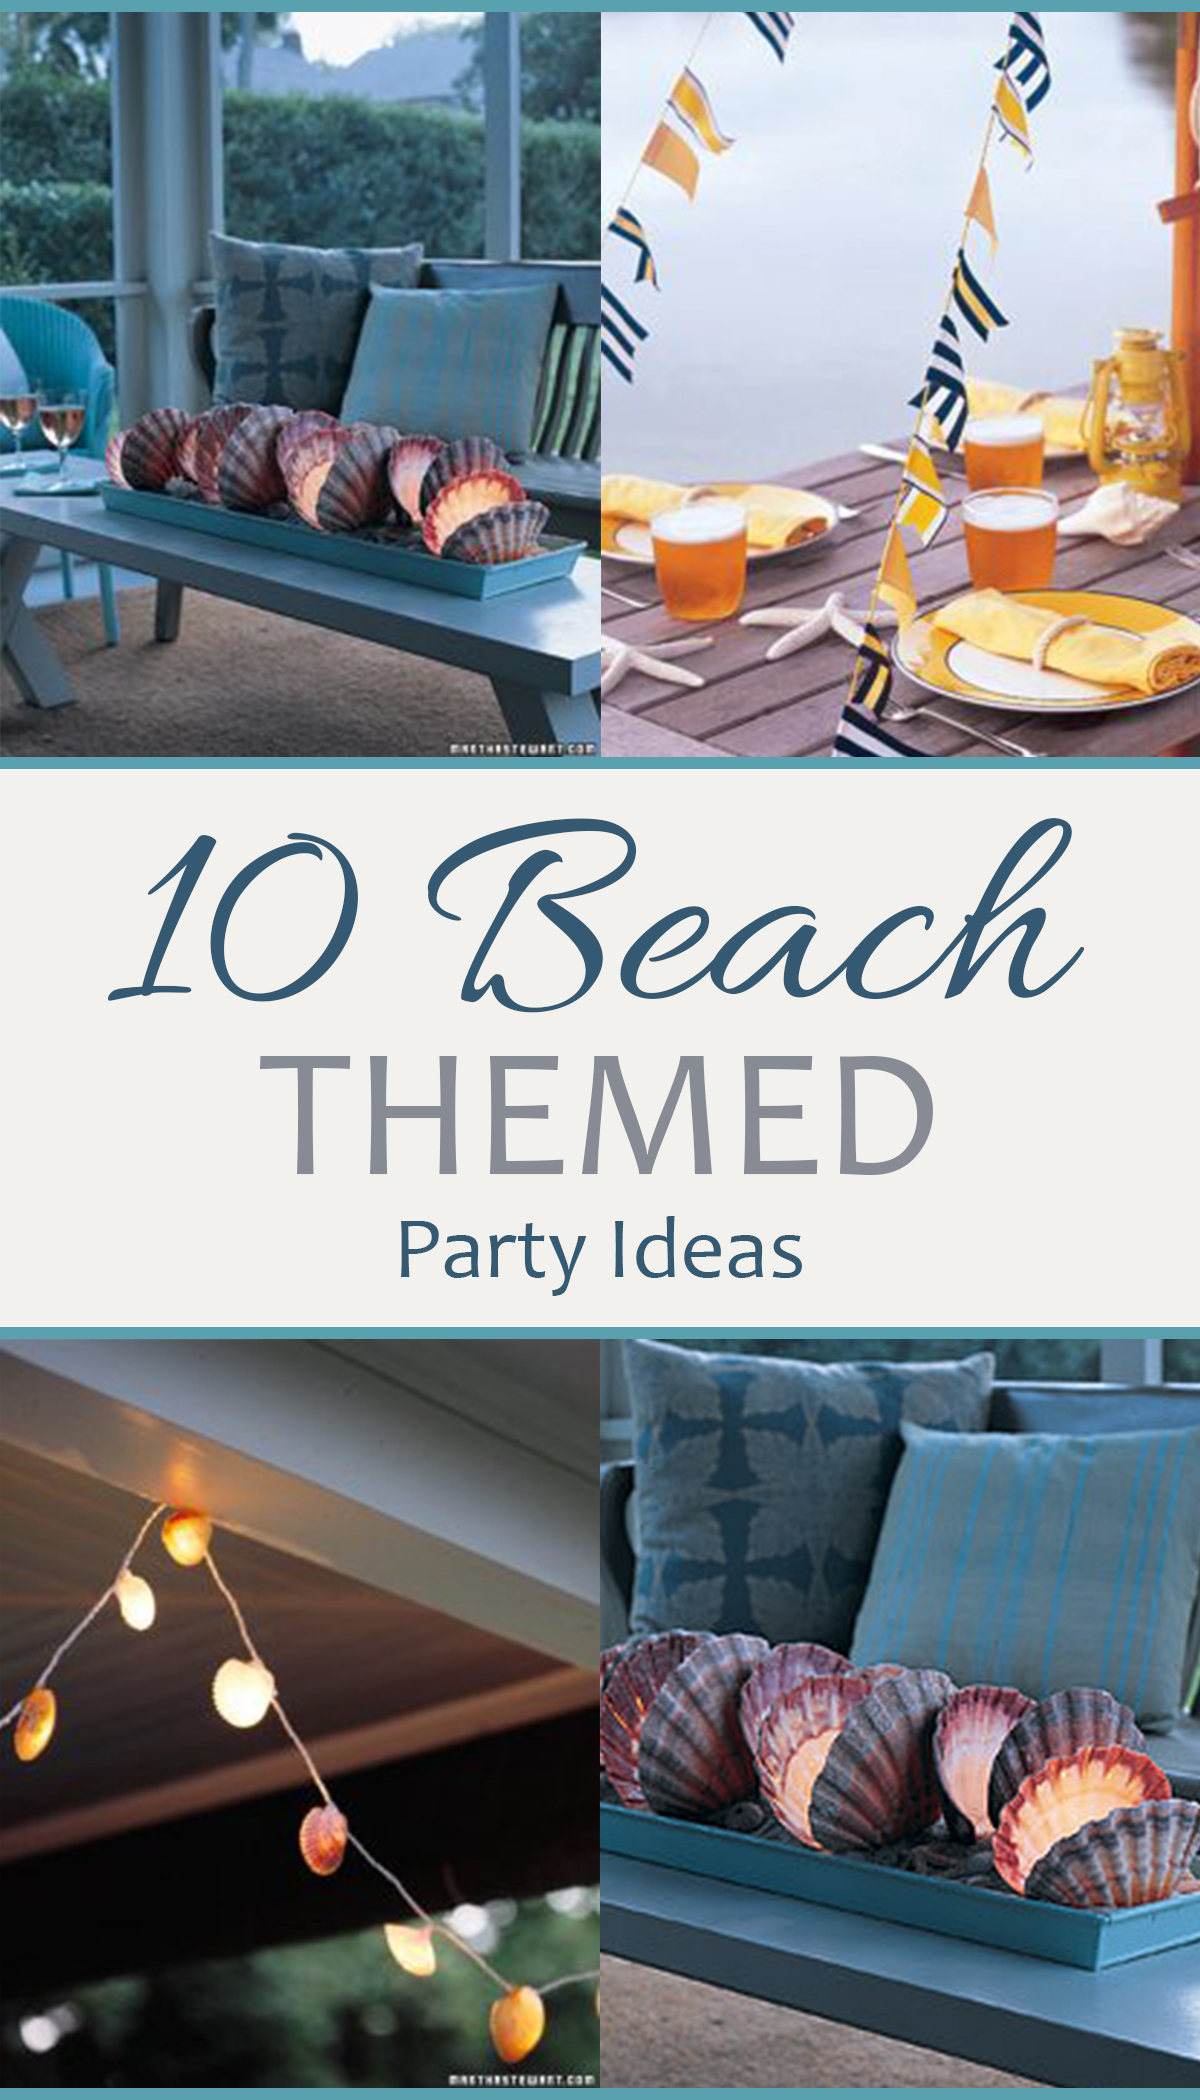 Fullsize Of Beach Party Ideas